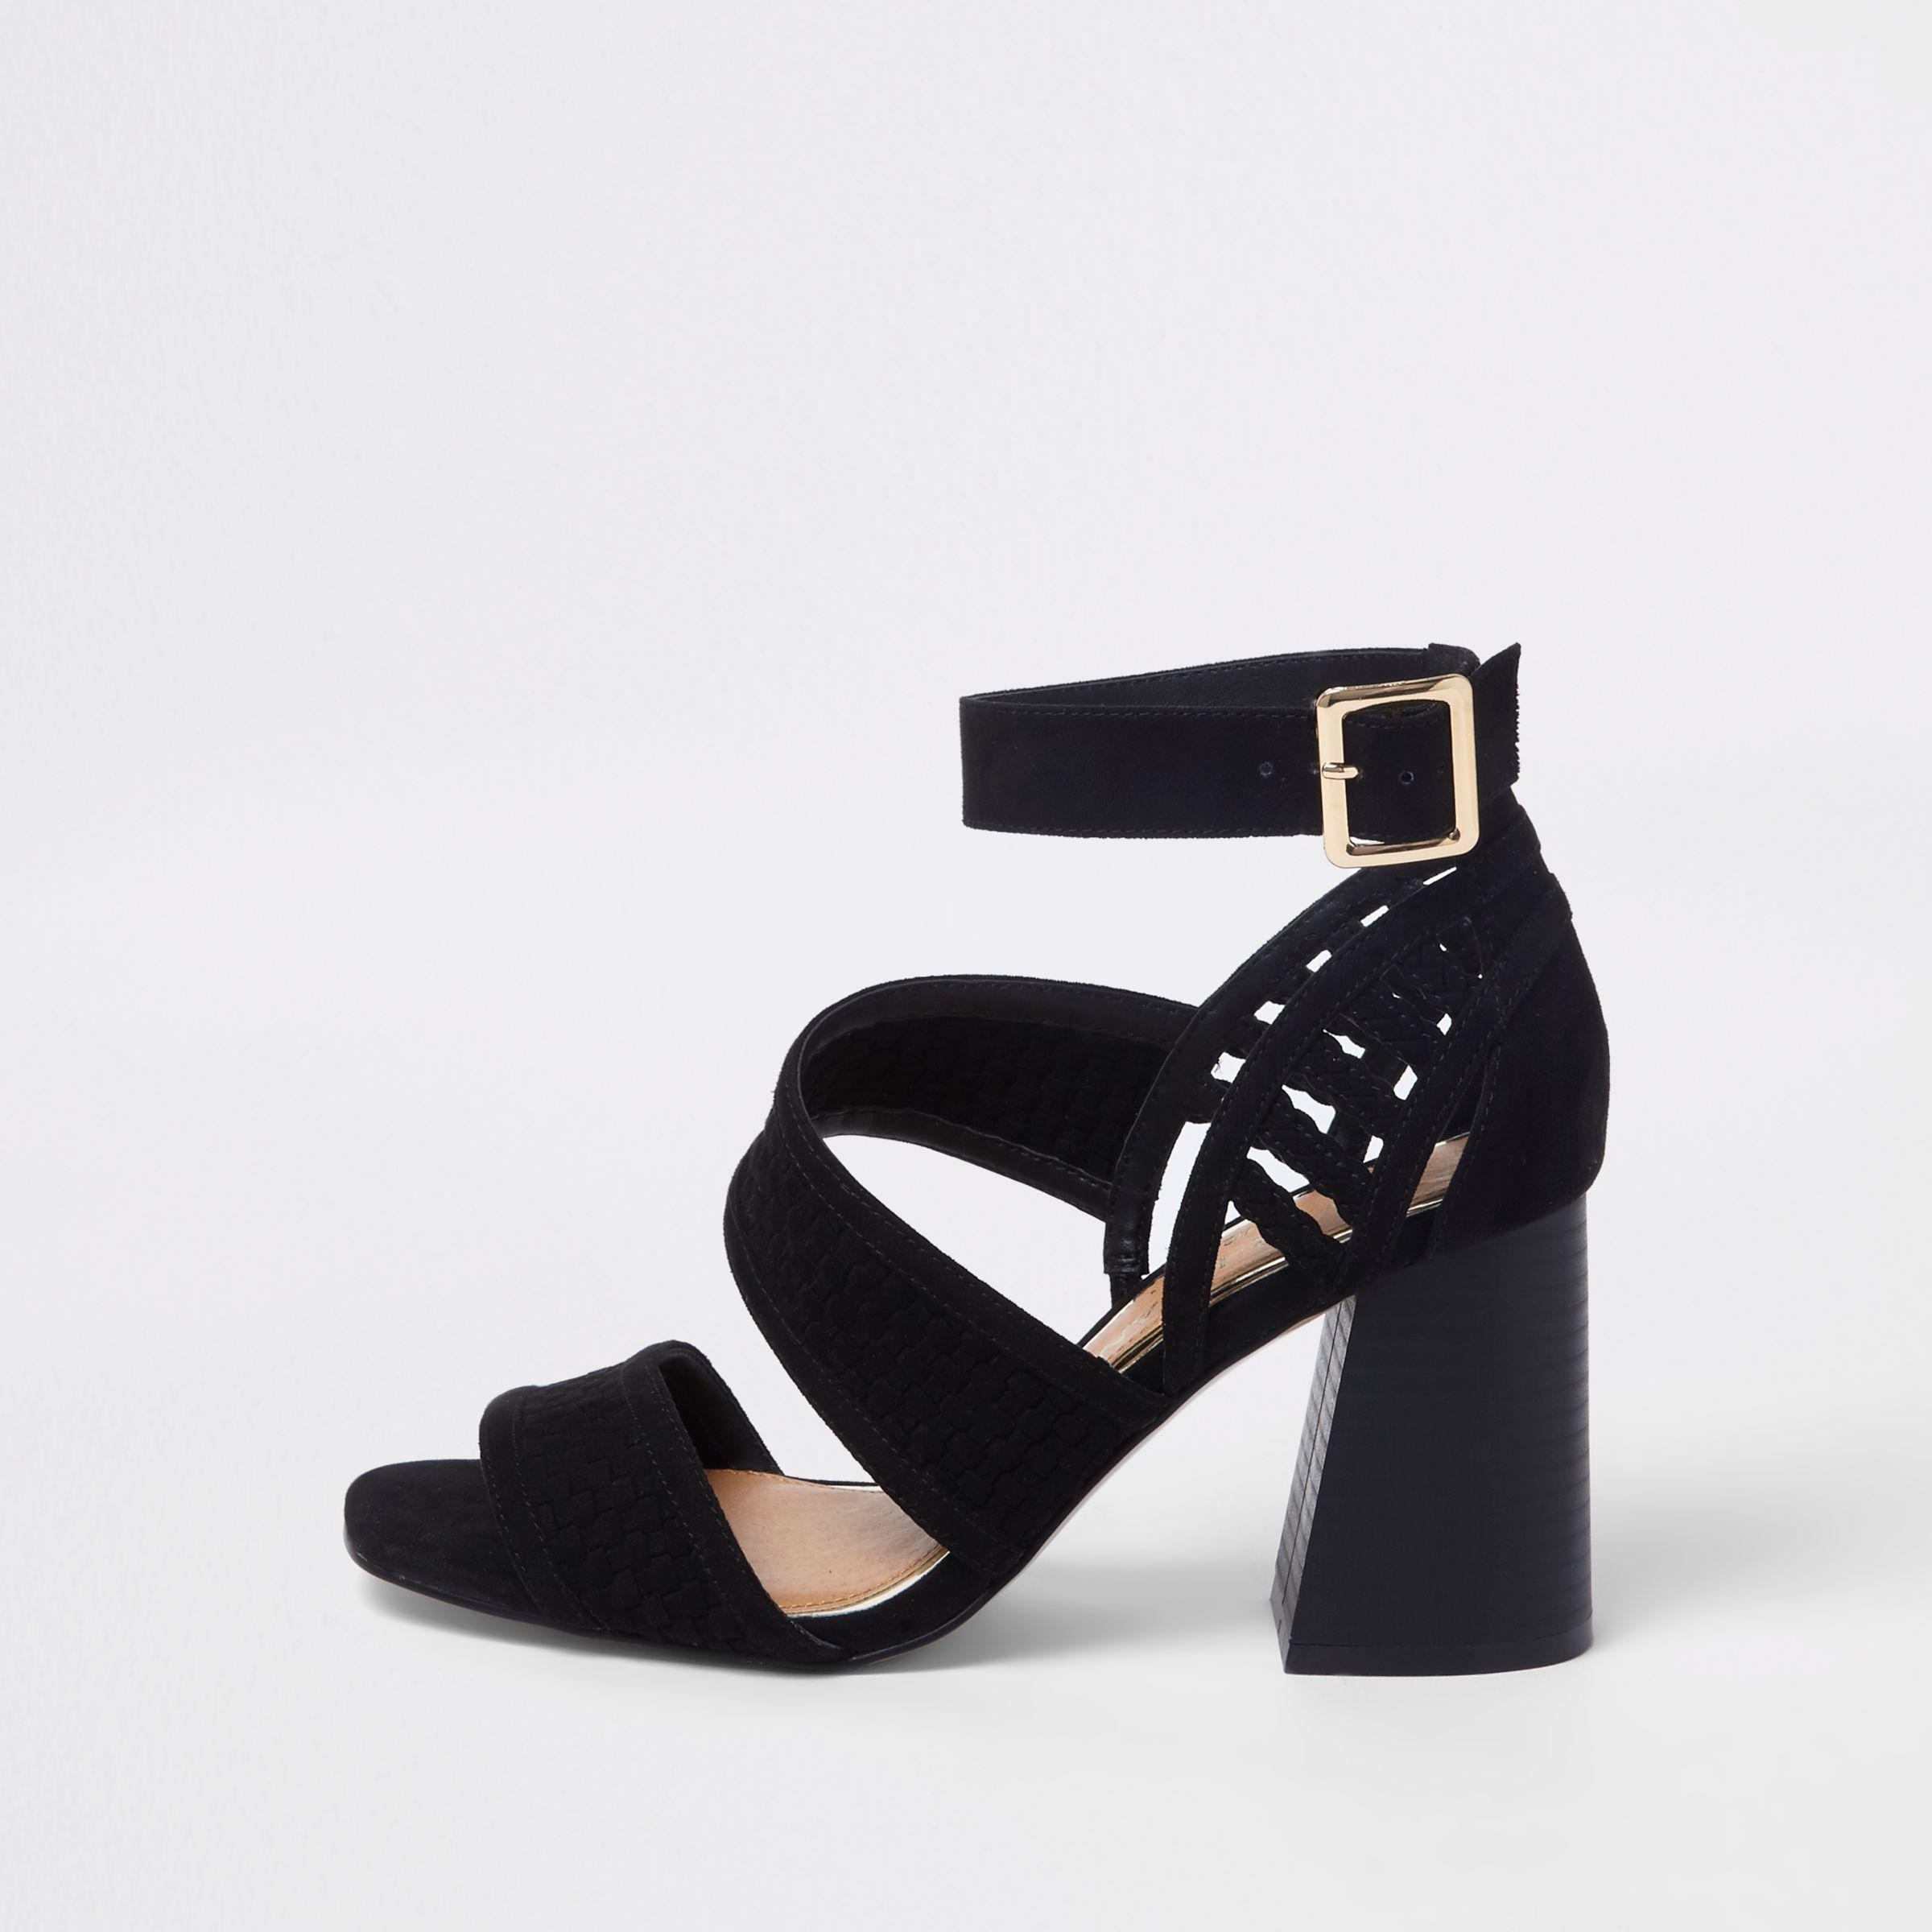 7bf6ec5d2 River Island Black Wide Fit Strappy Block Heel Sandals in Black - Lyst